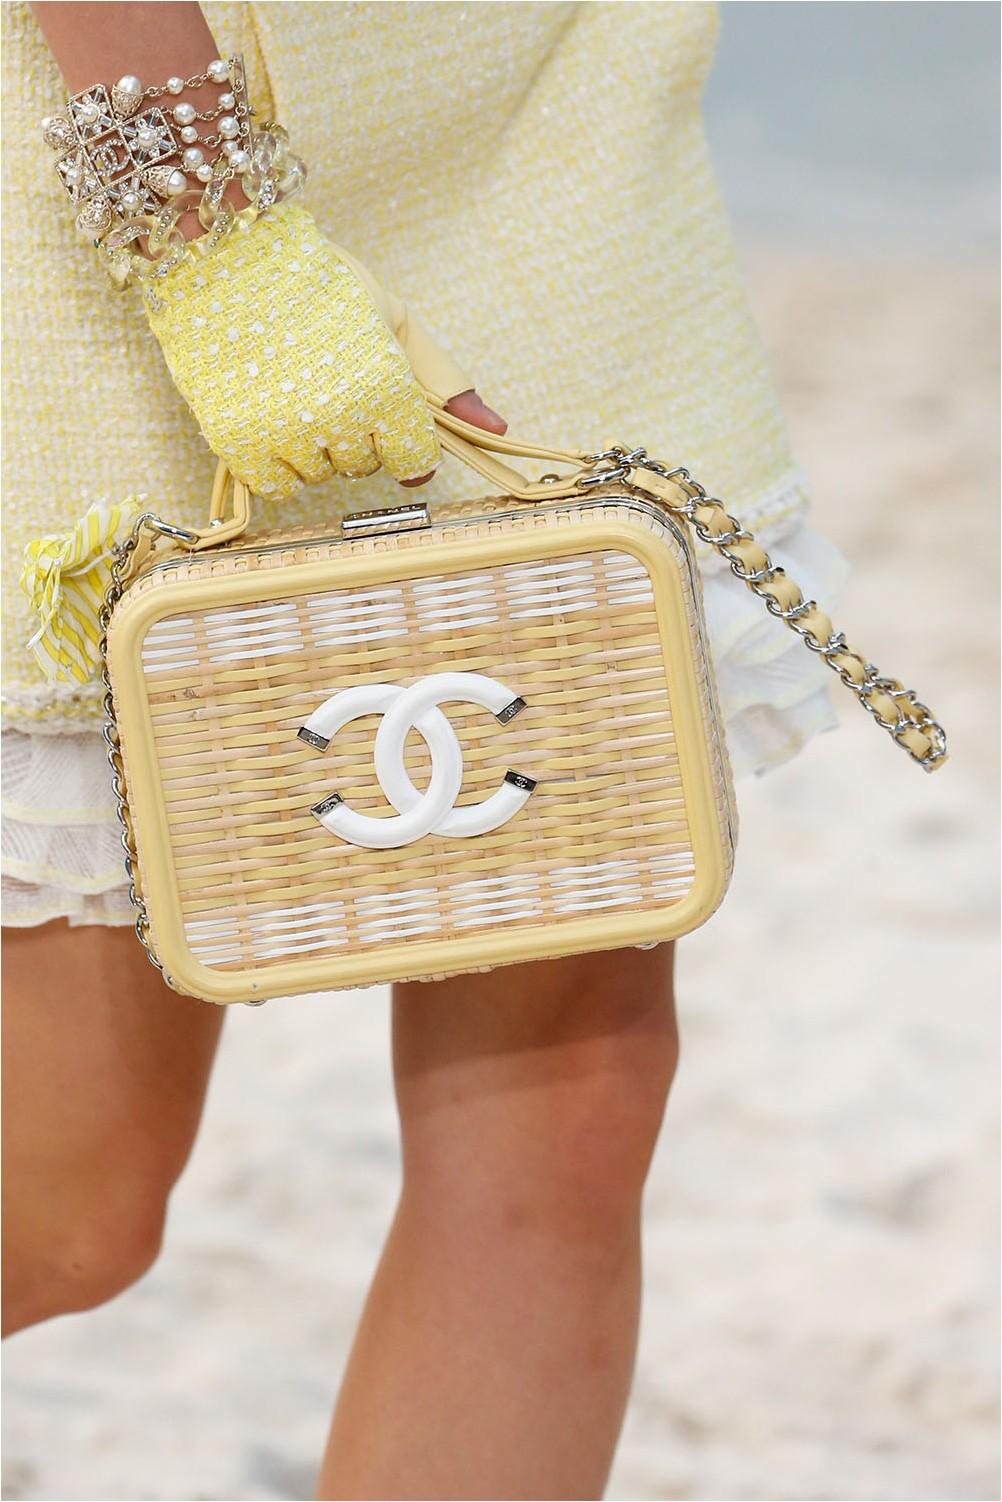 Chanel Box Bags